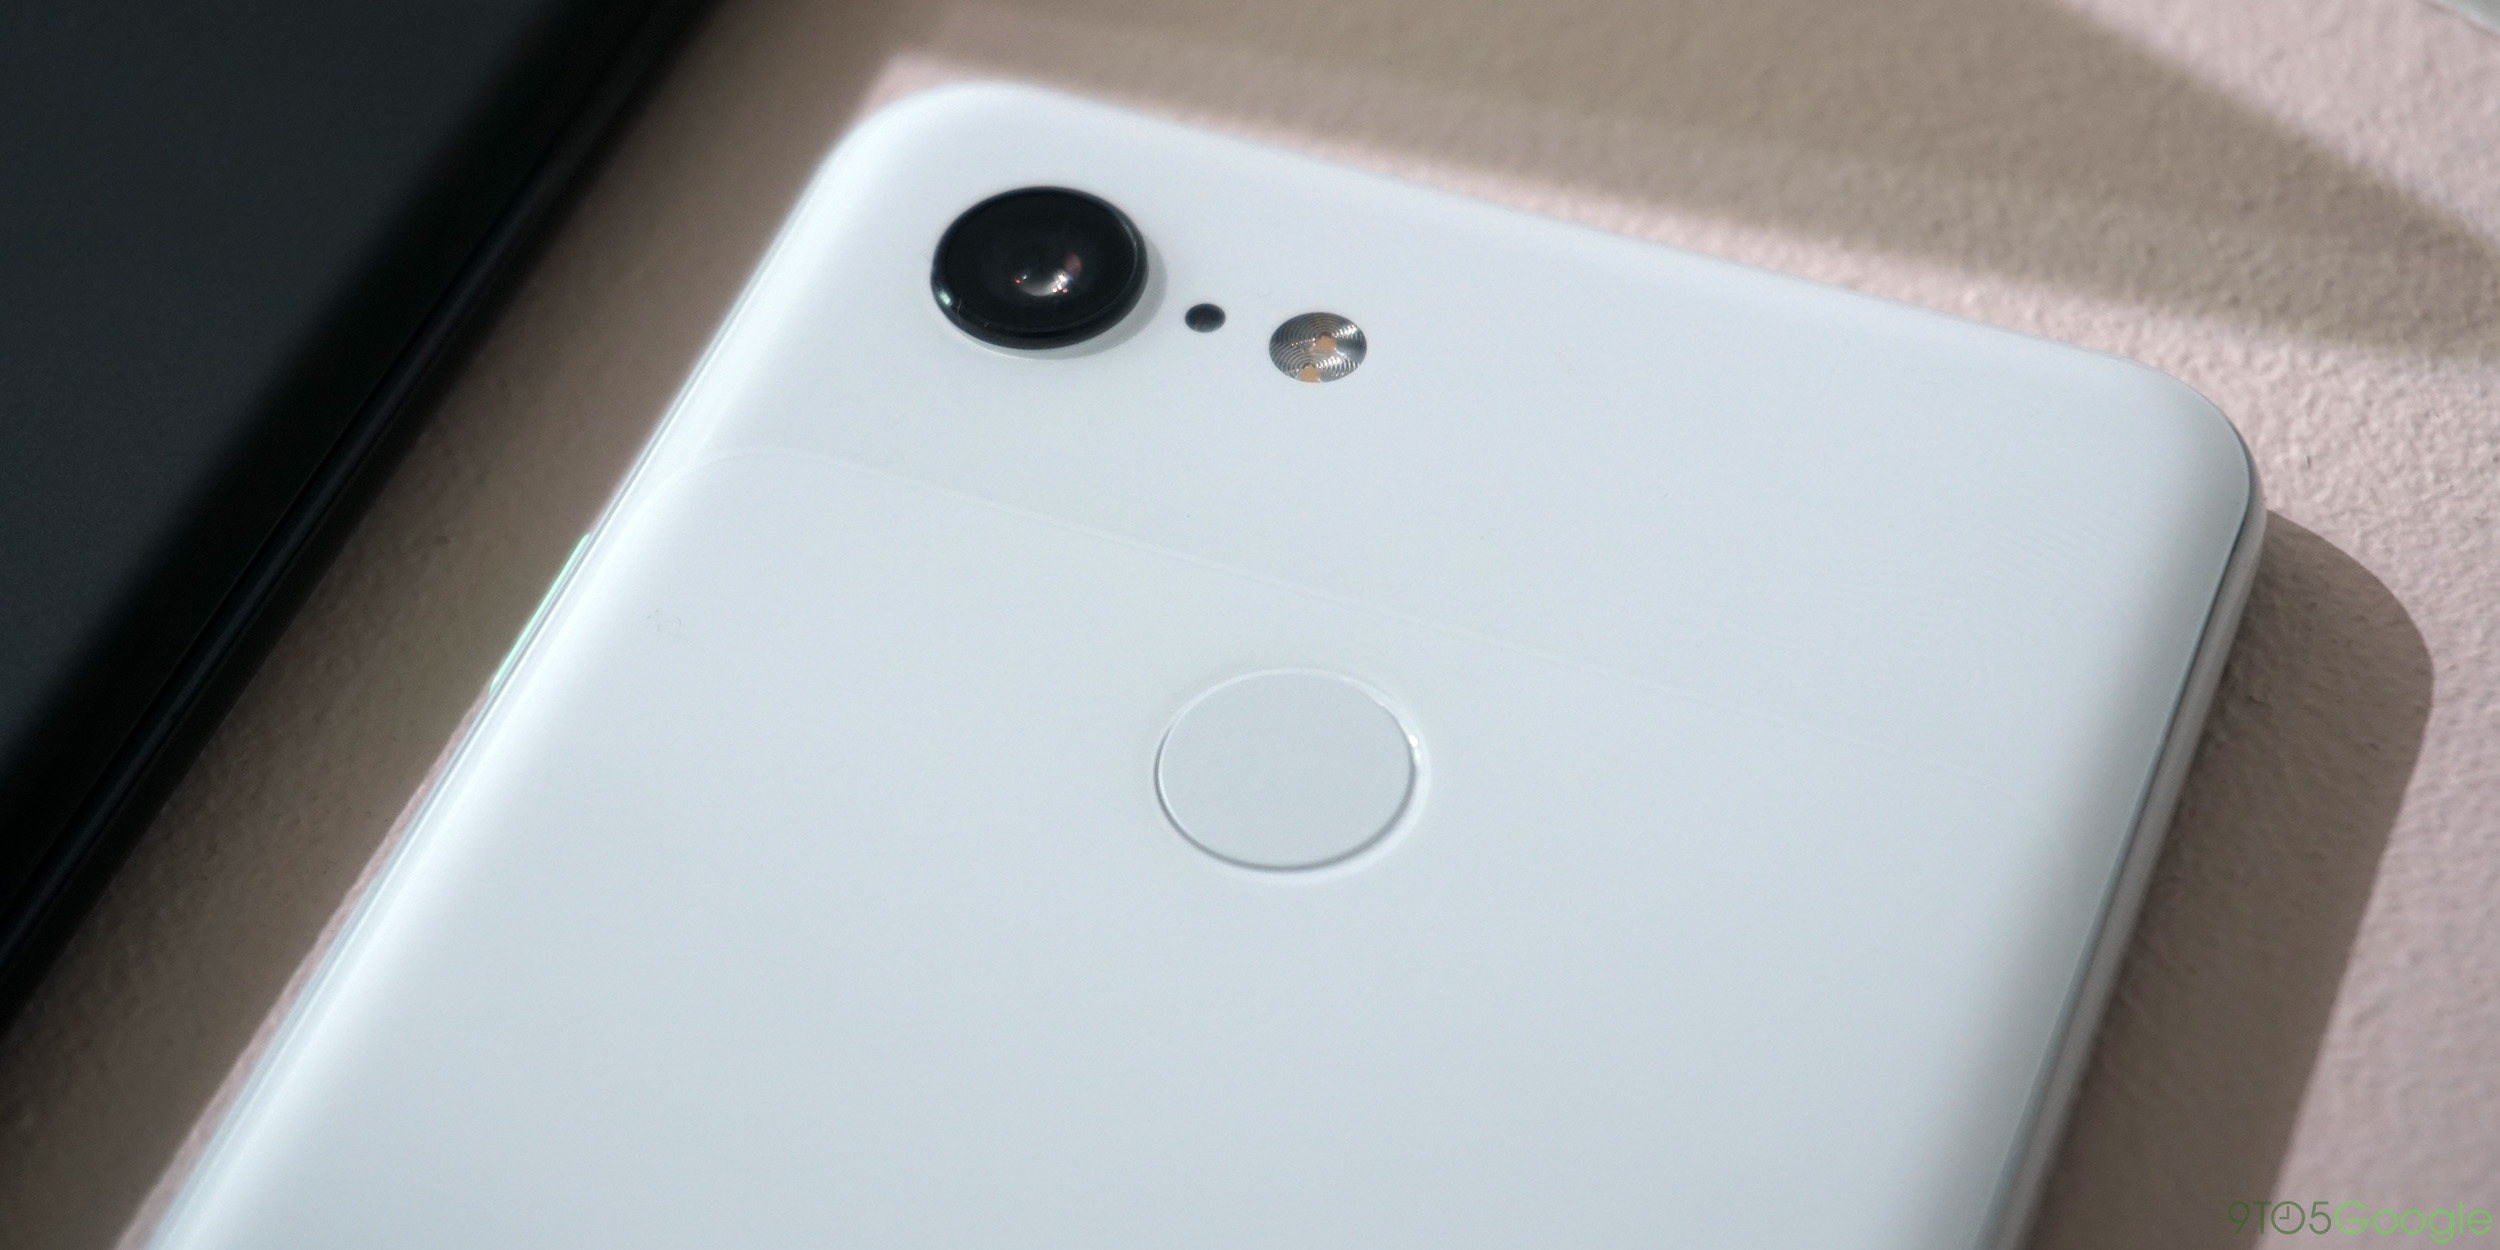 pixel 3 camera tidbits pixel visual core tasks google s opinion on dual cameras night sight details more